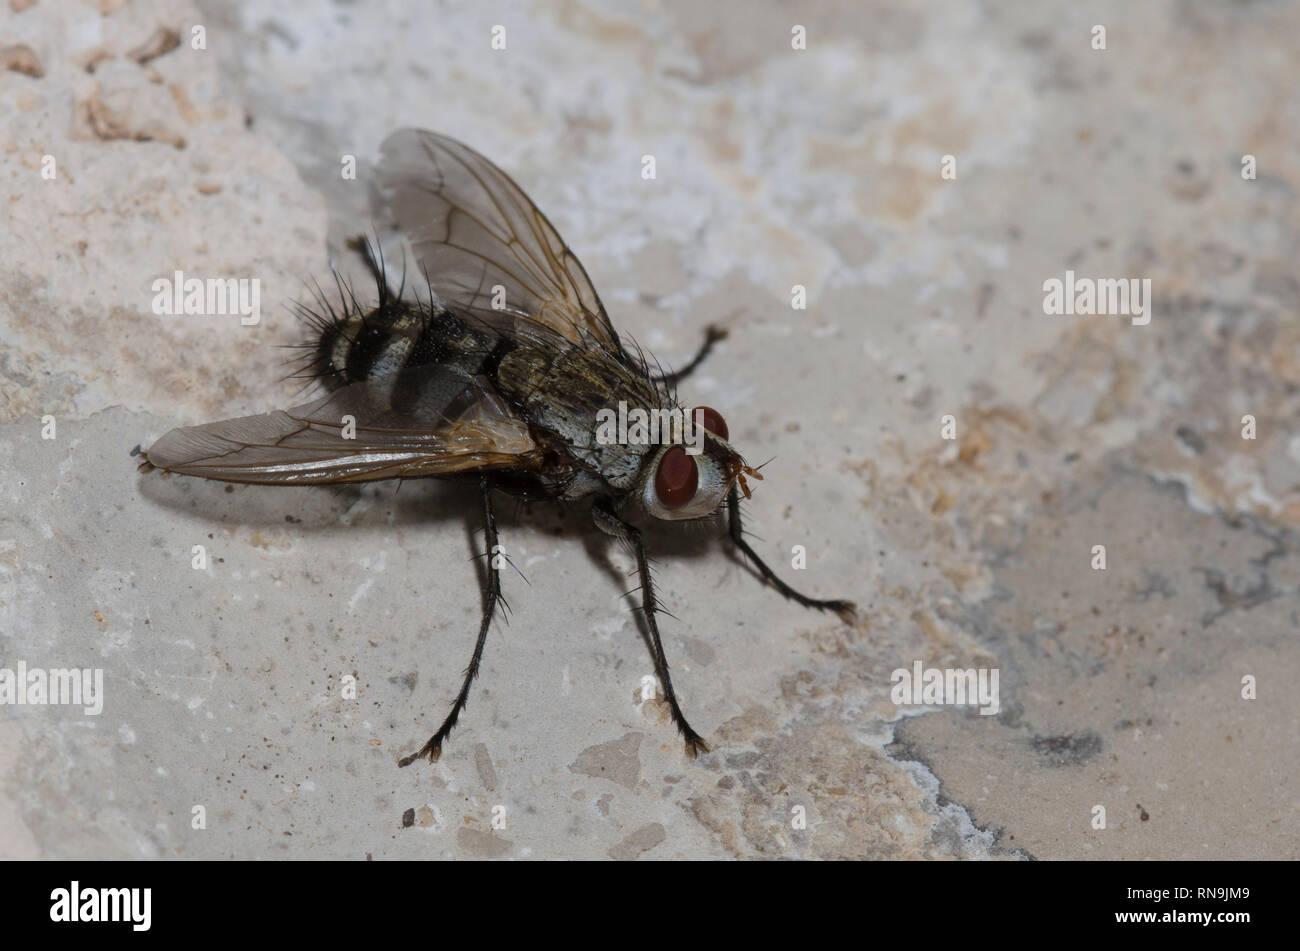 Tachinid Fly, Microphthalma disjuncta Stock Photo